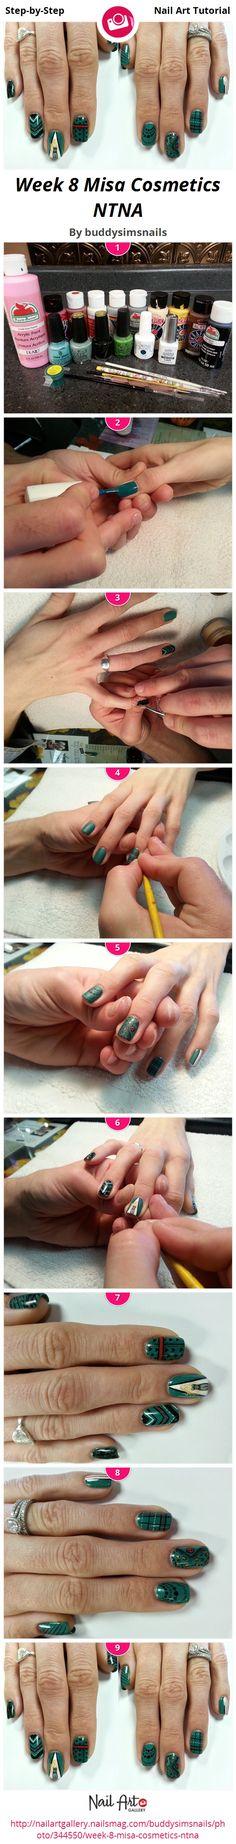 334 best Nail Art How-To Tutorials images on Pinterest | Fingernail ...